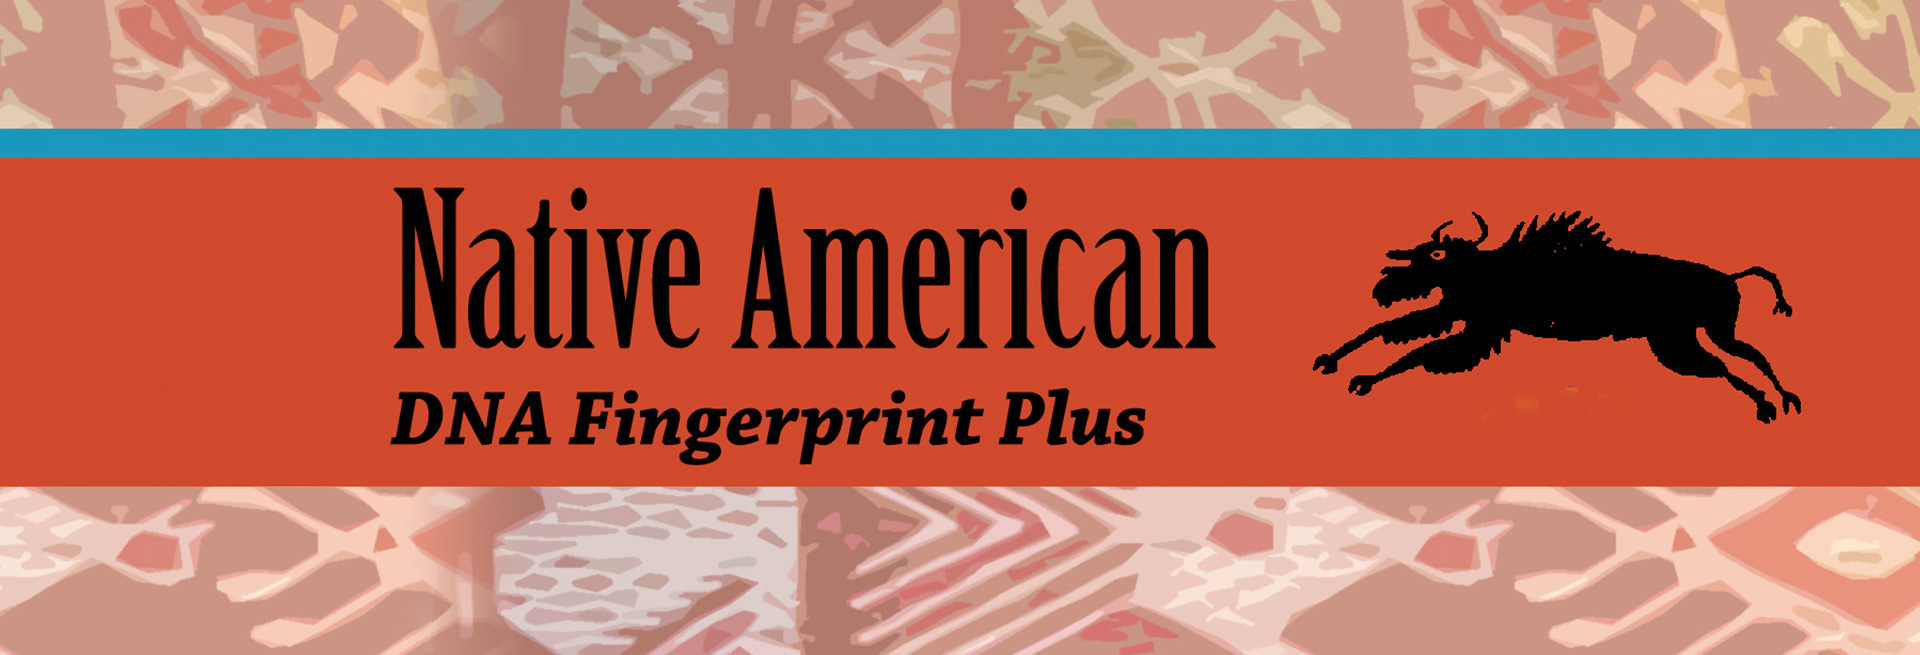 Native American DNA Fingerprint Plus Test